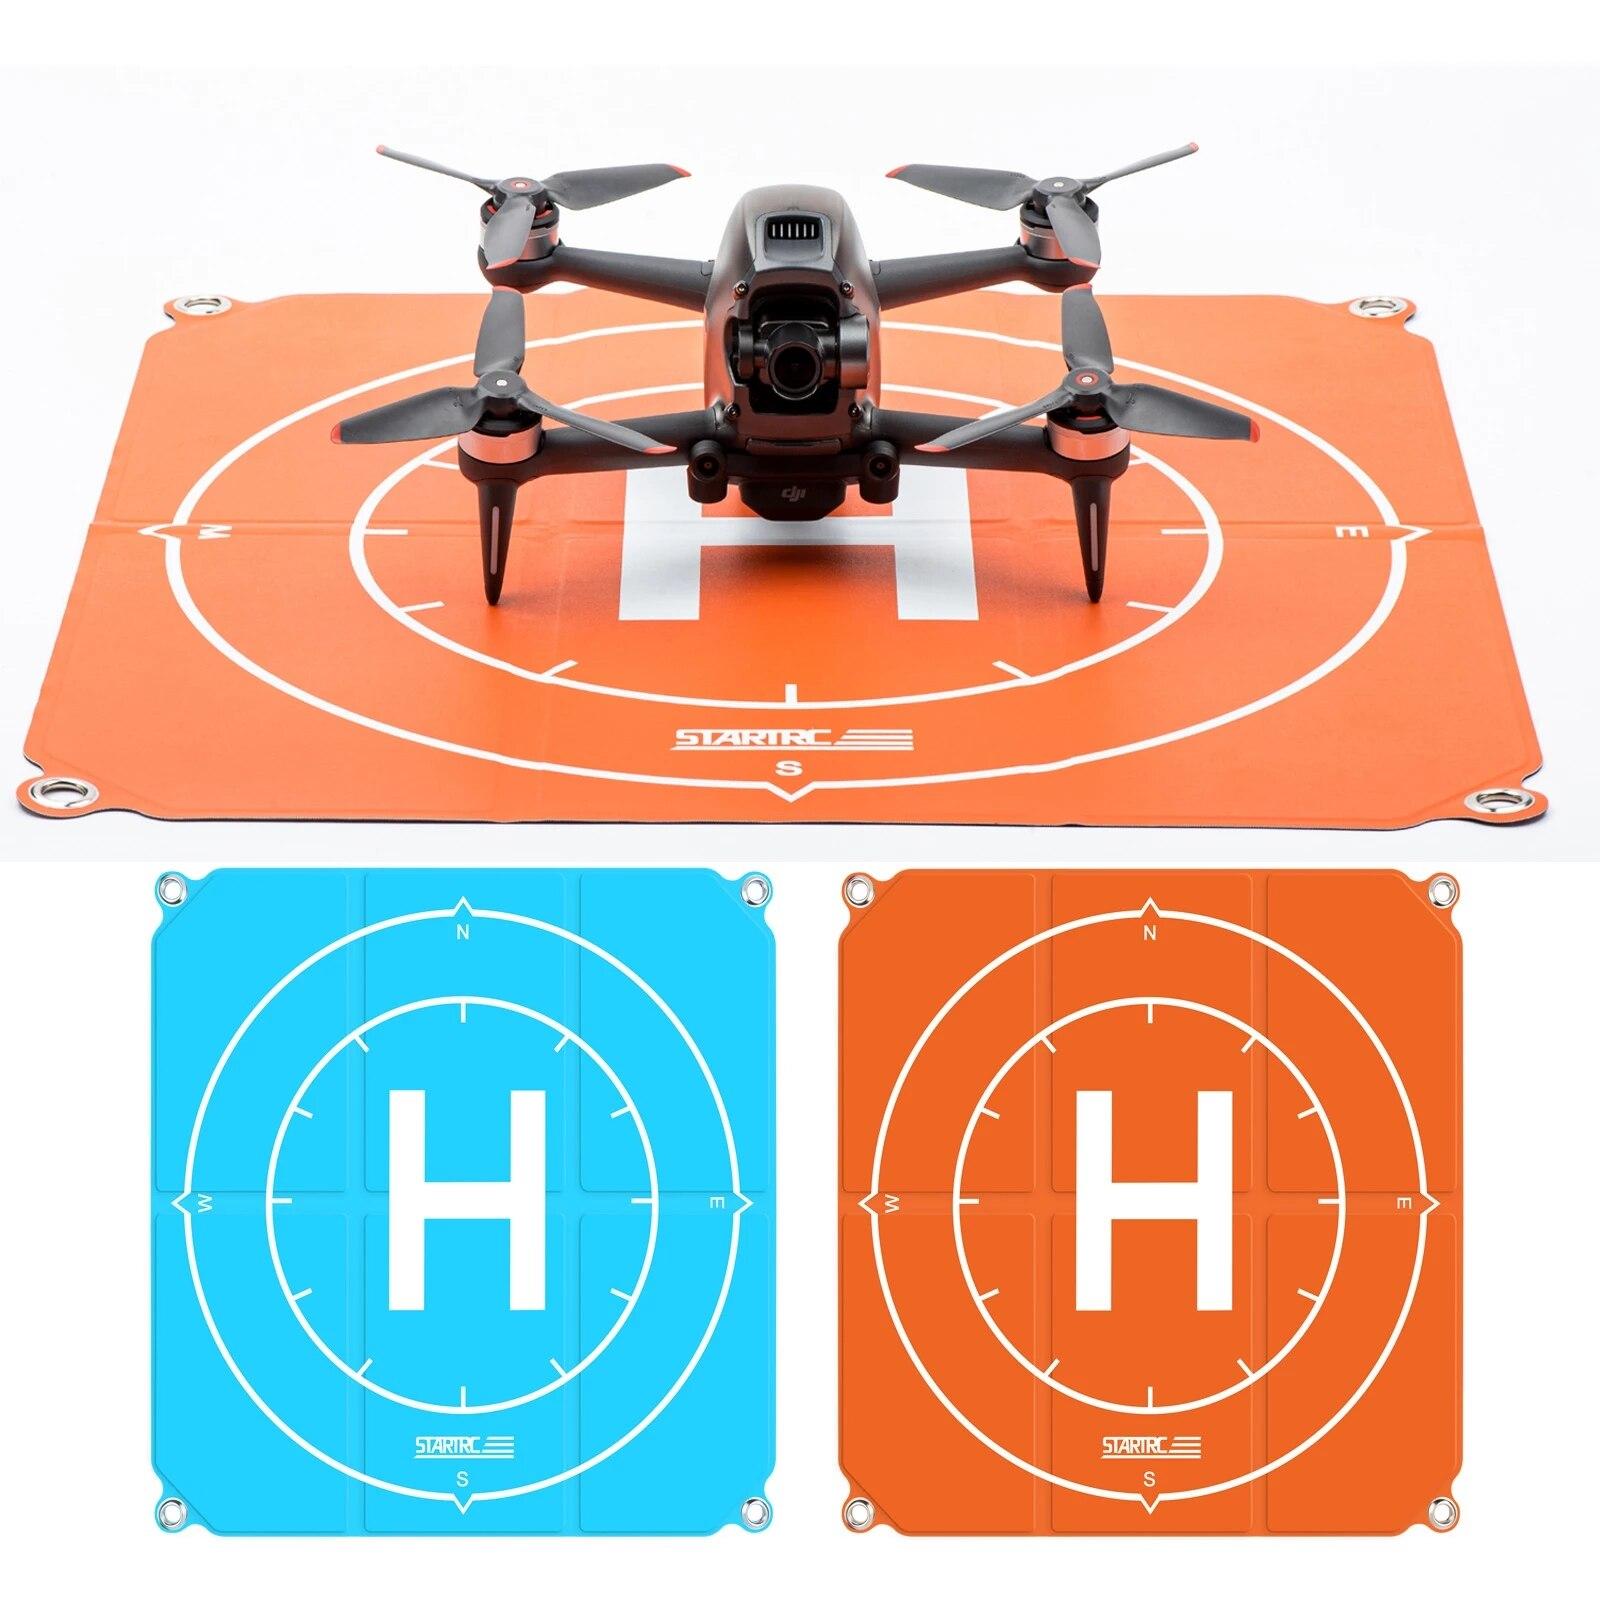 plataforma-de-aterrizaje-para-dron-dji-plataforma-de-estacionamiento-plegable-de-50cm-almohadilla-universal-impermeable-para-dji-combo-fpv-accesorios